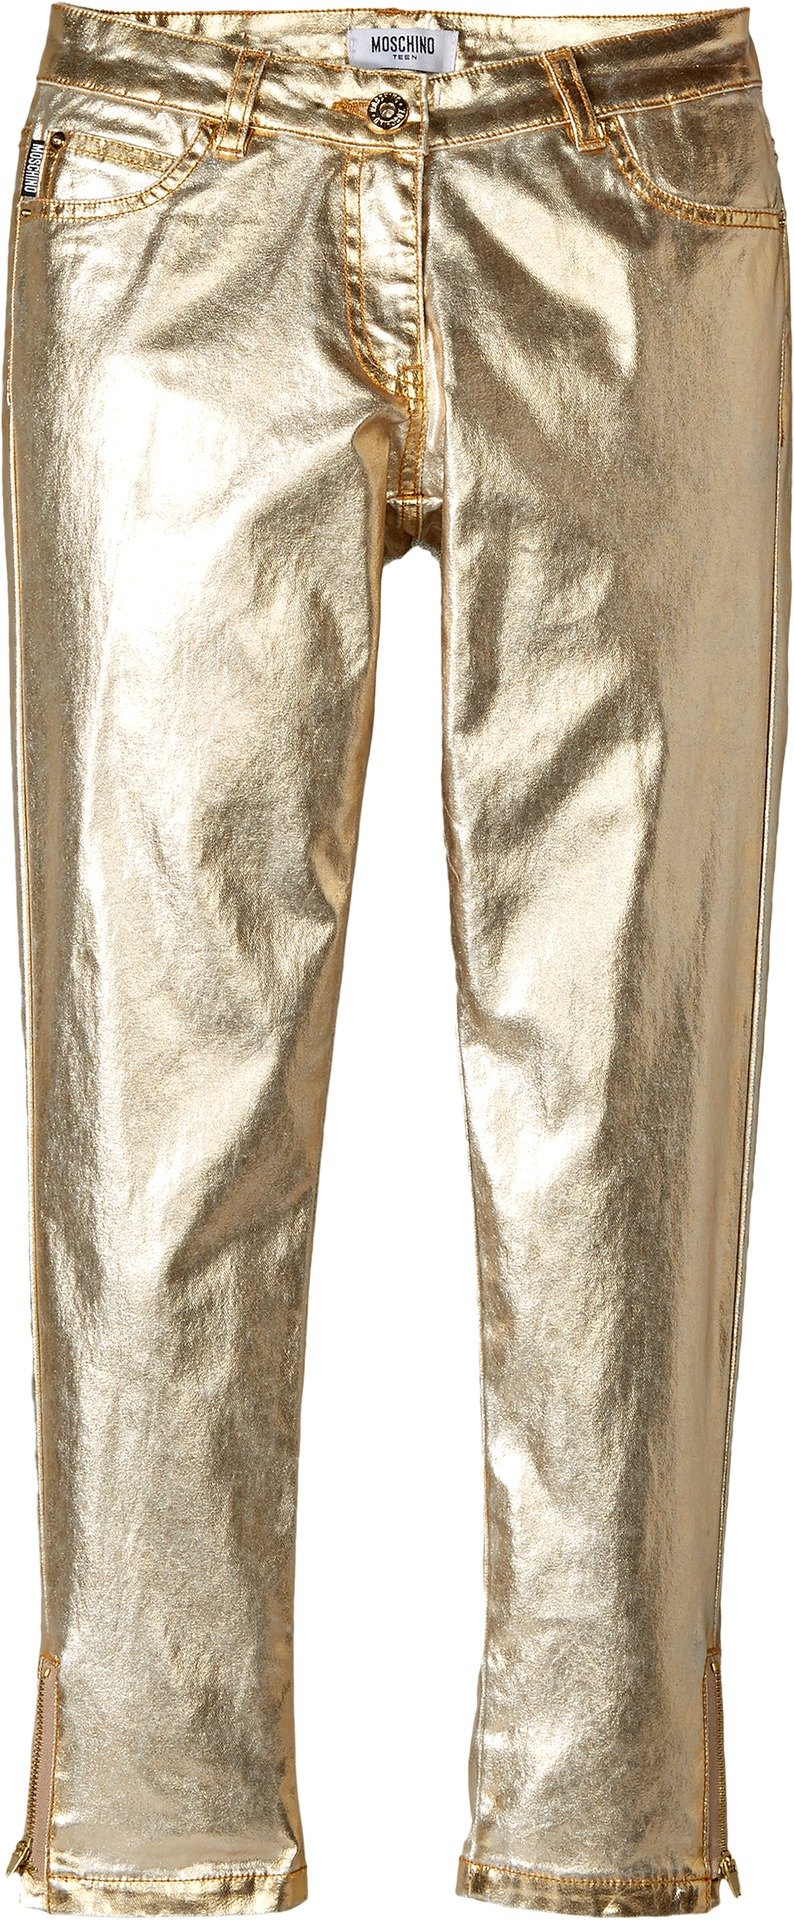 Moschino Kids Girl's Pants w/Logo on Back Pockets (Big Kids) Gold 14 Big Kids